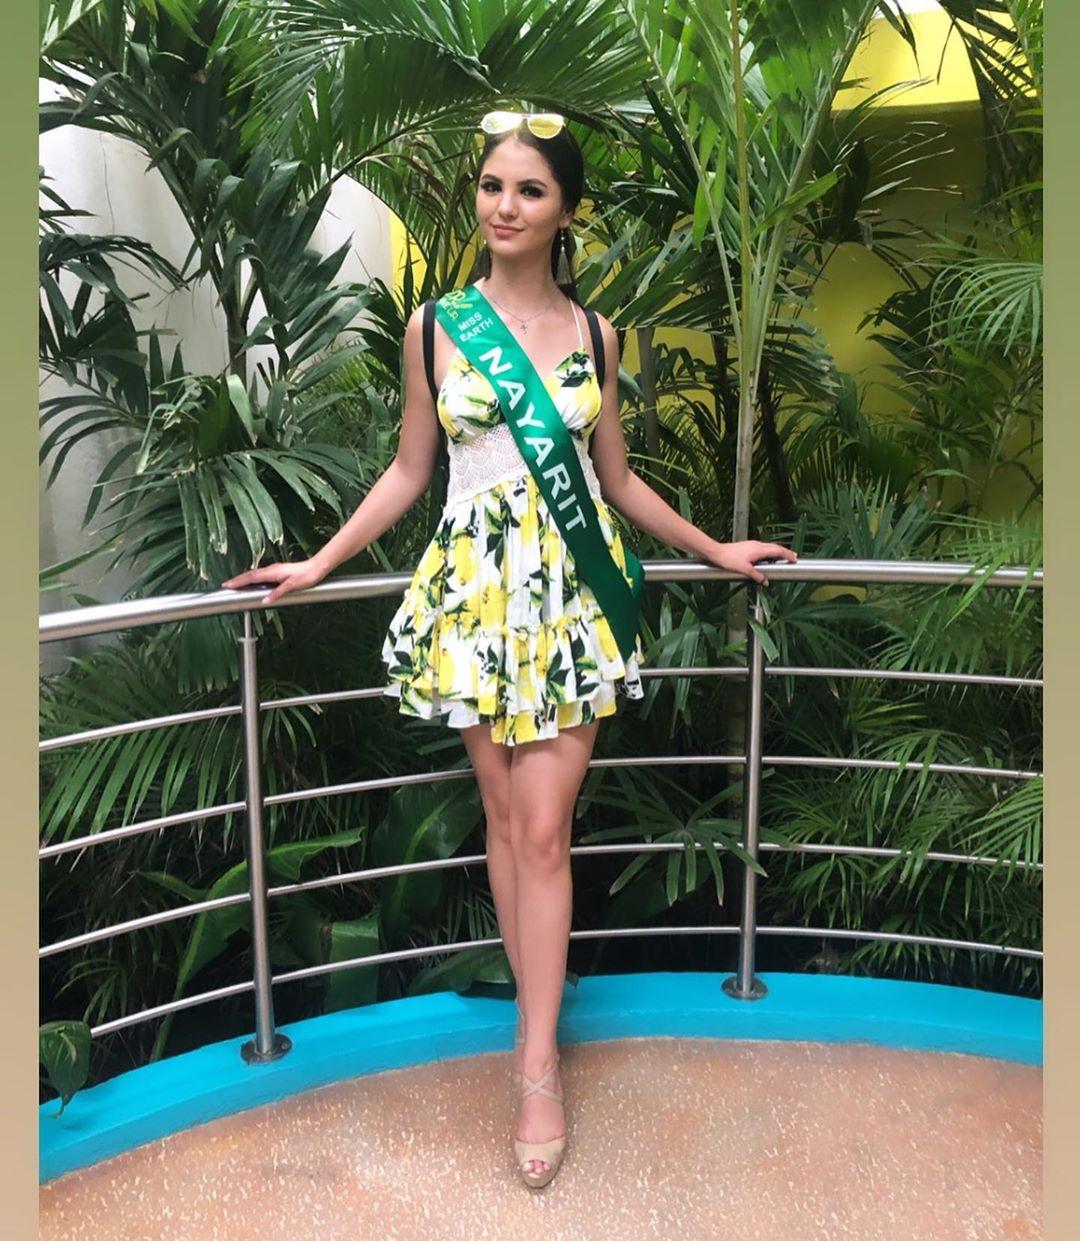 hilary islas, miss earth mexico 2019. - Página 6 59785410